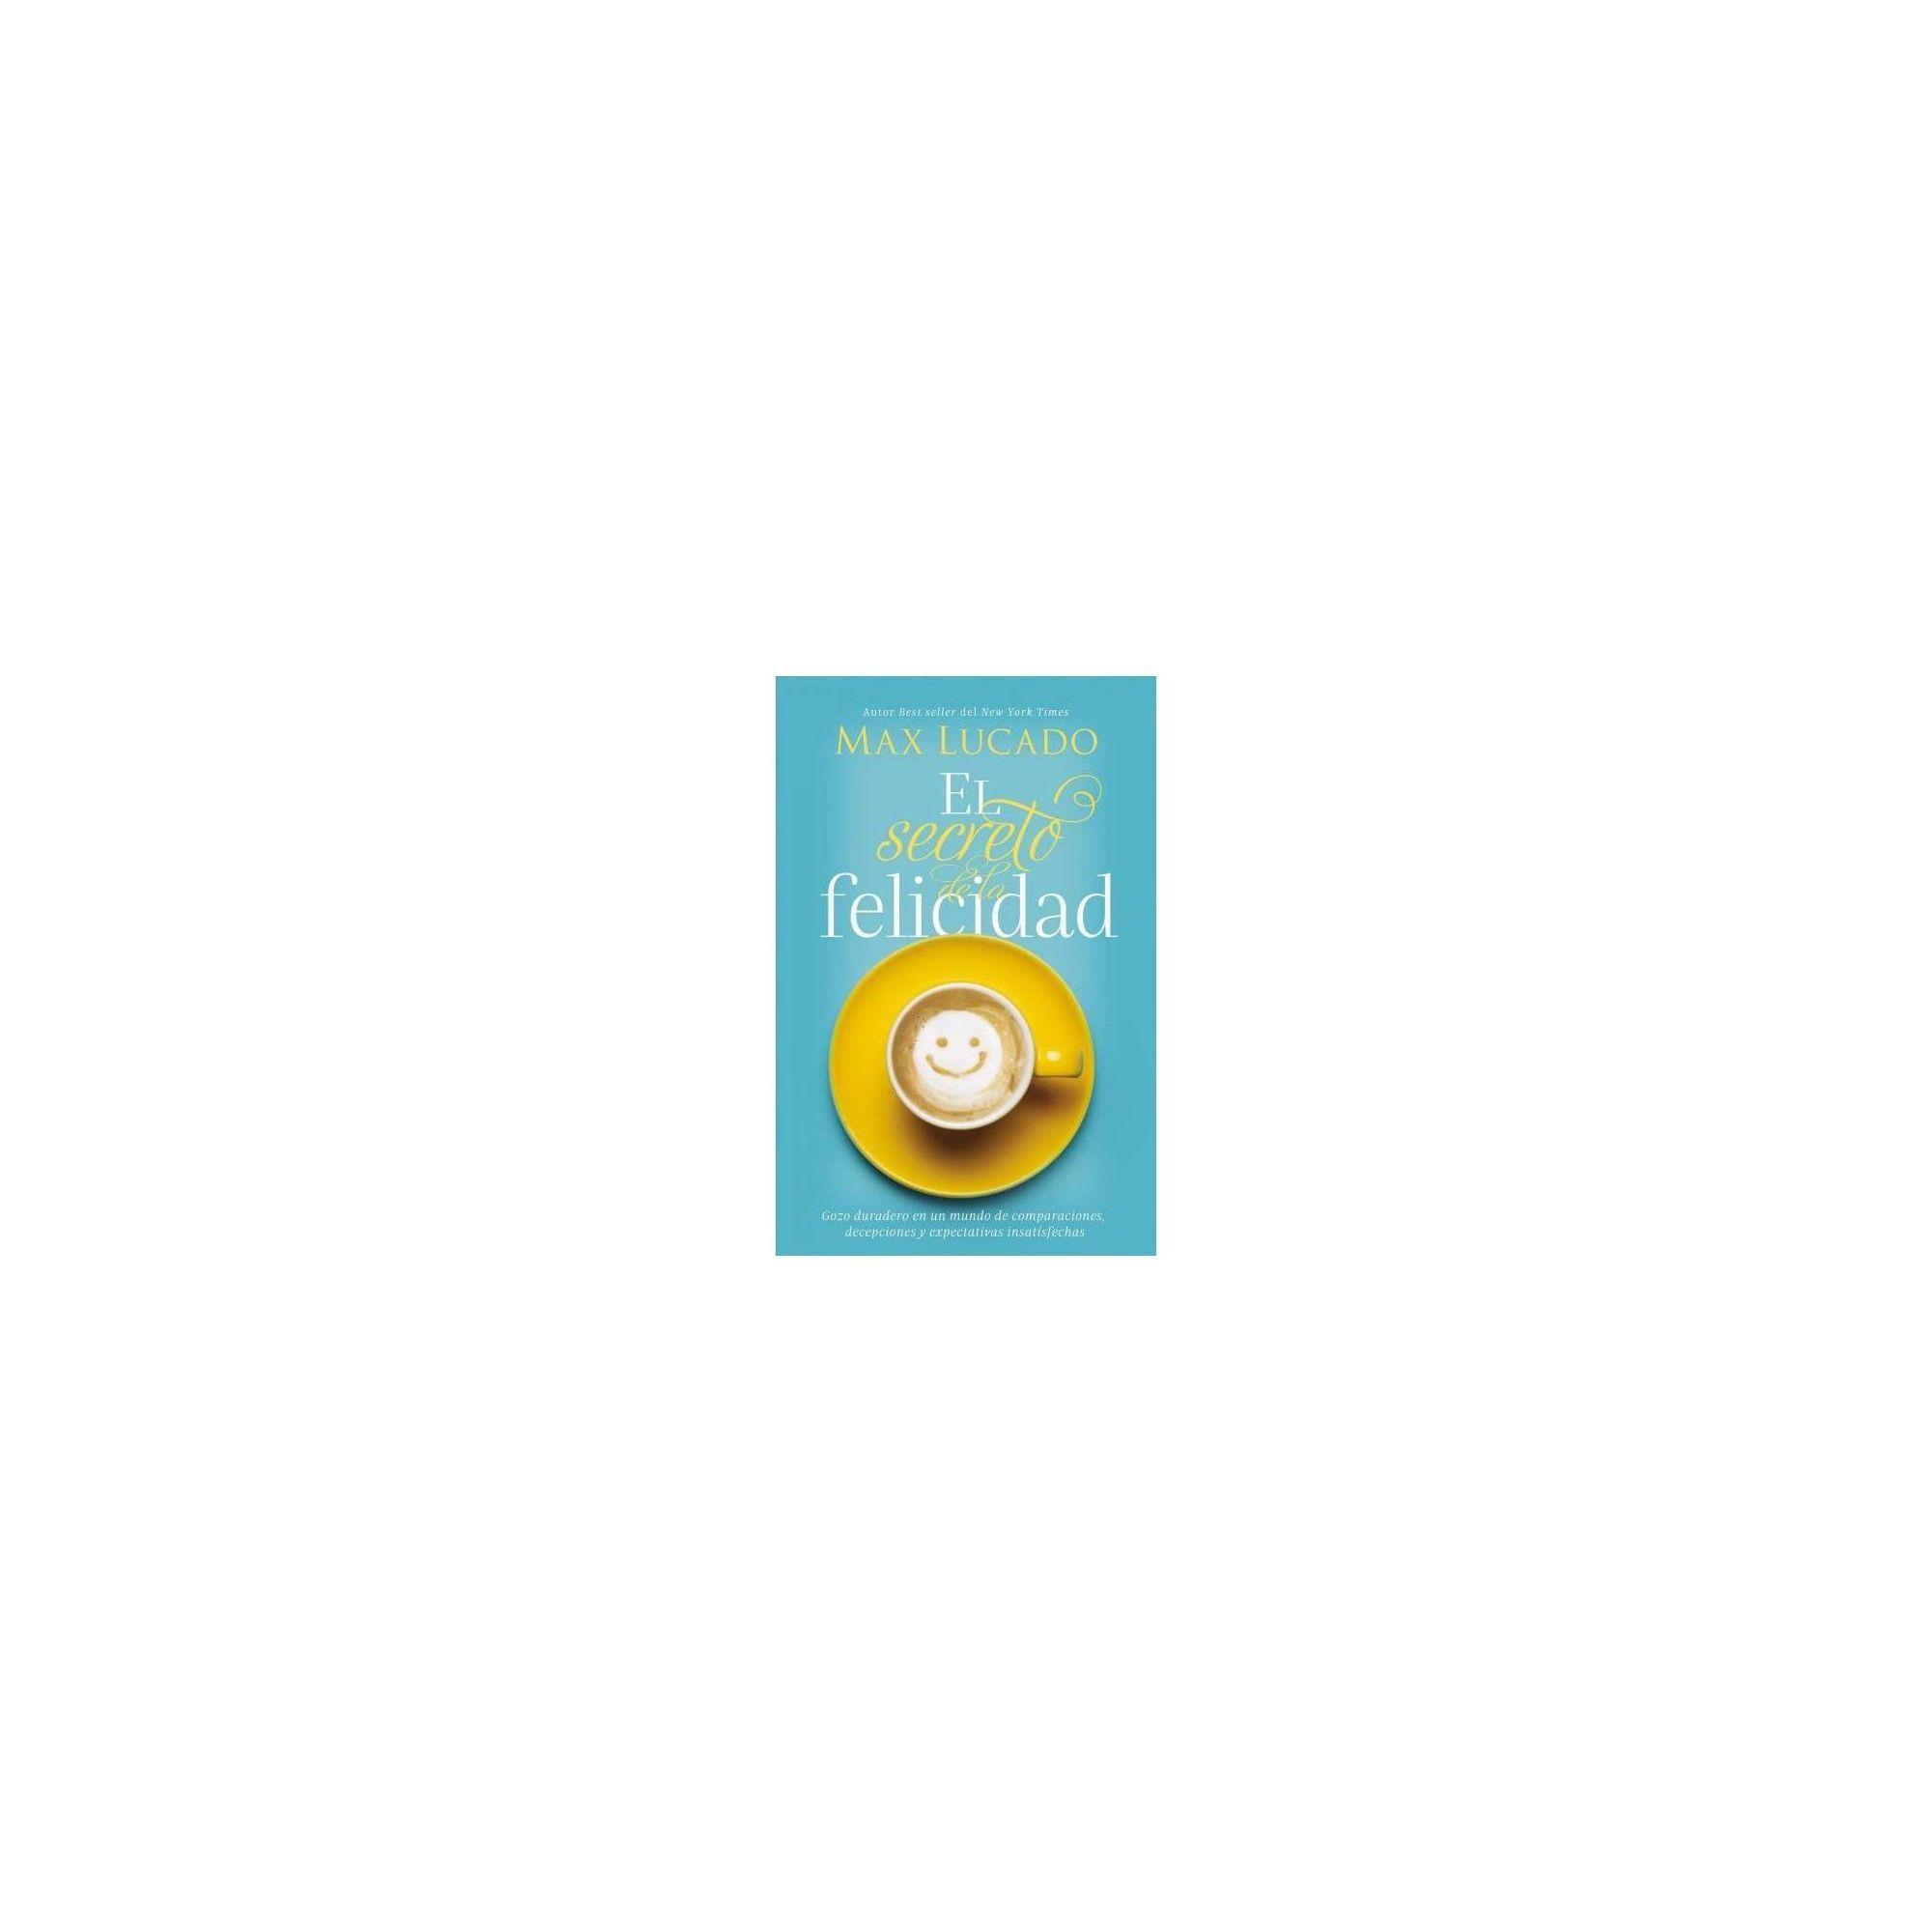 El Secreto De La Felicidad How Happiness Happens Spanish Edition By Max Lucado Paperback Christian Books Christian Printables Christian Coloring Book